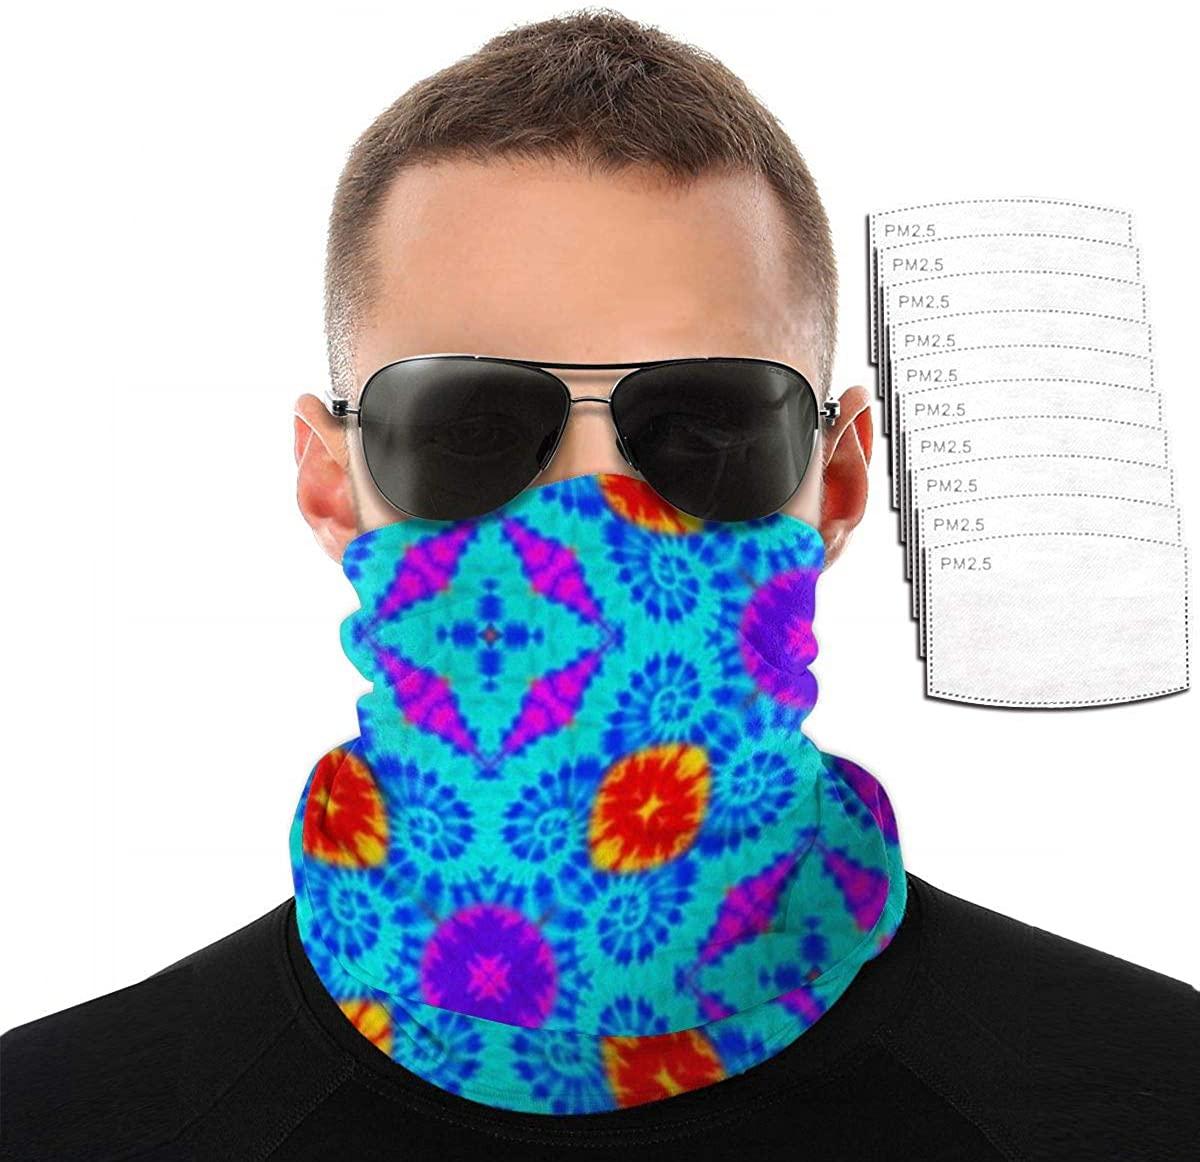 Colorful Tie Dye Vintage Pigment Scarves, face Towels, veils, Masks, Wristbands, Hair Bands, Pirate Hats, Riding Masks